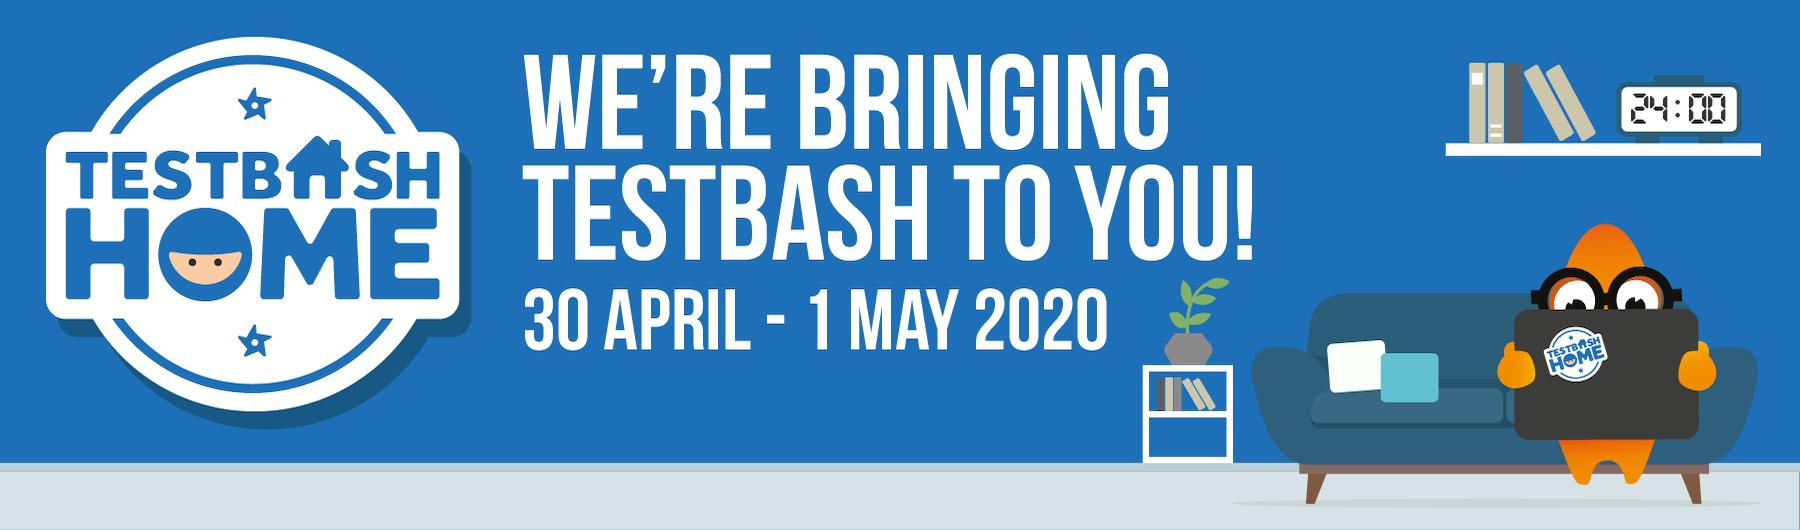 TestBash Home 2020